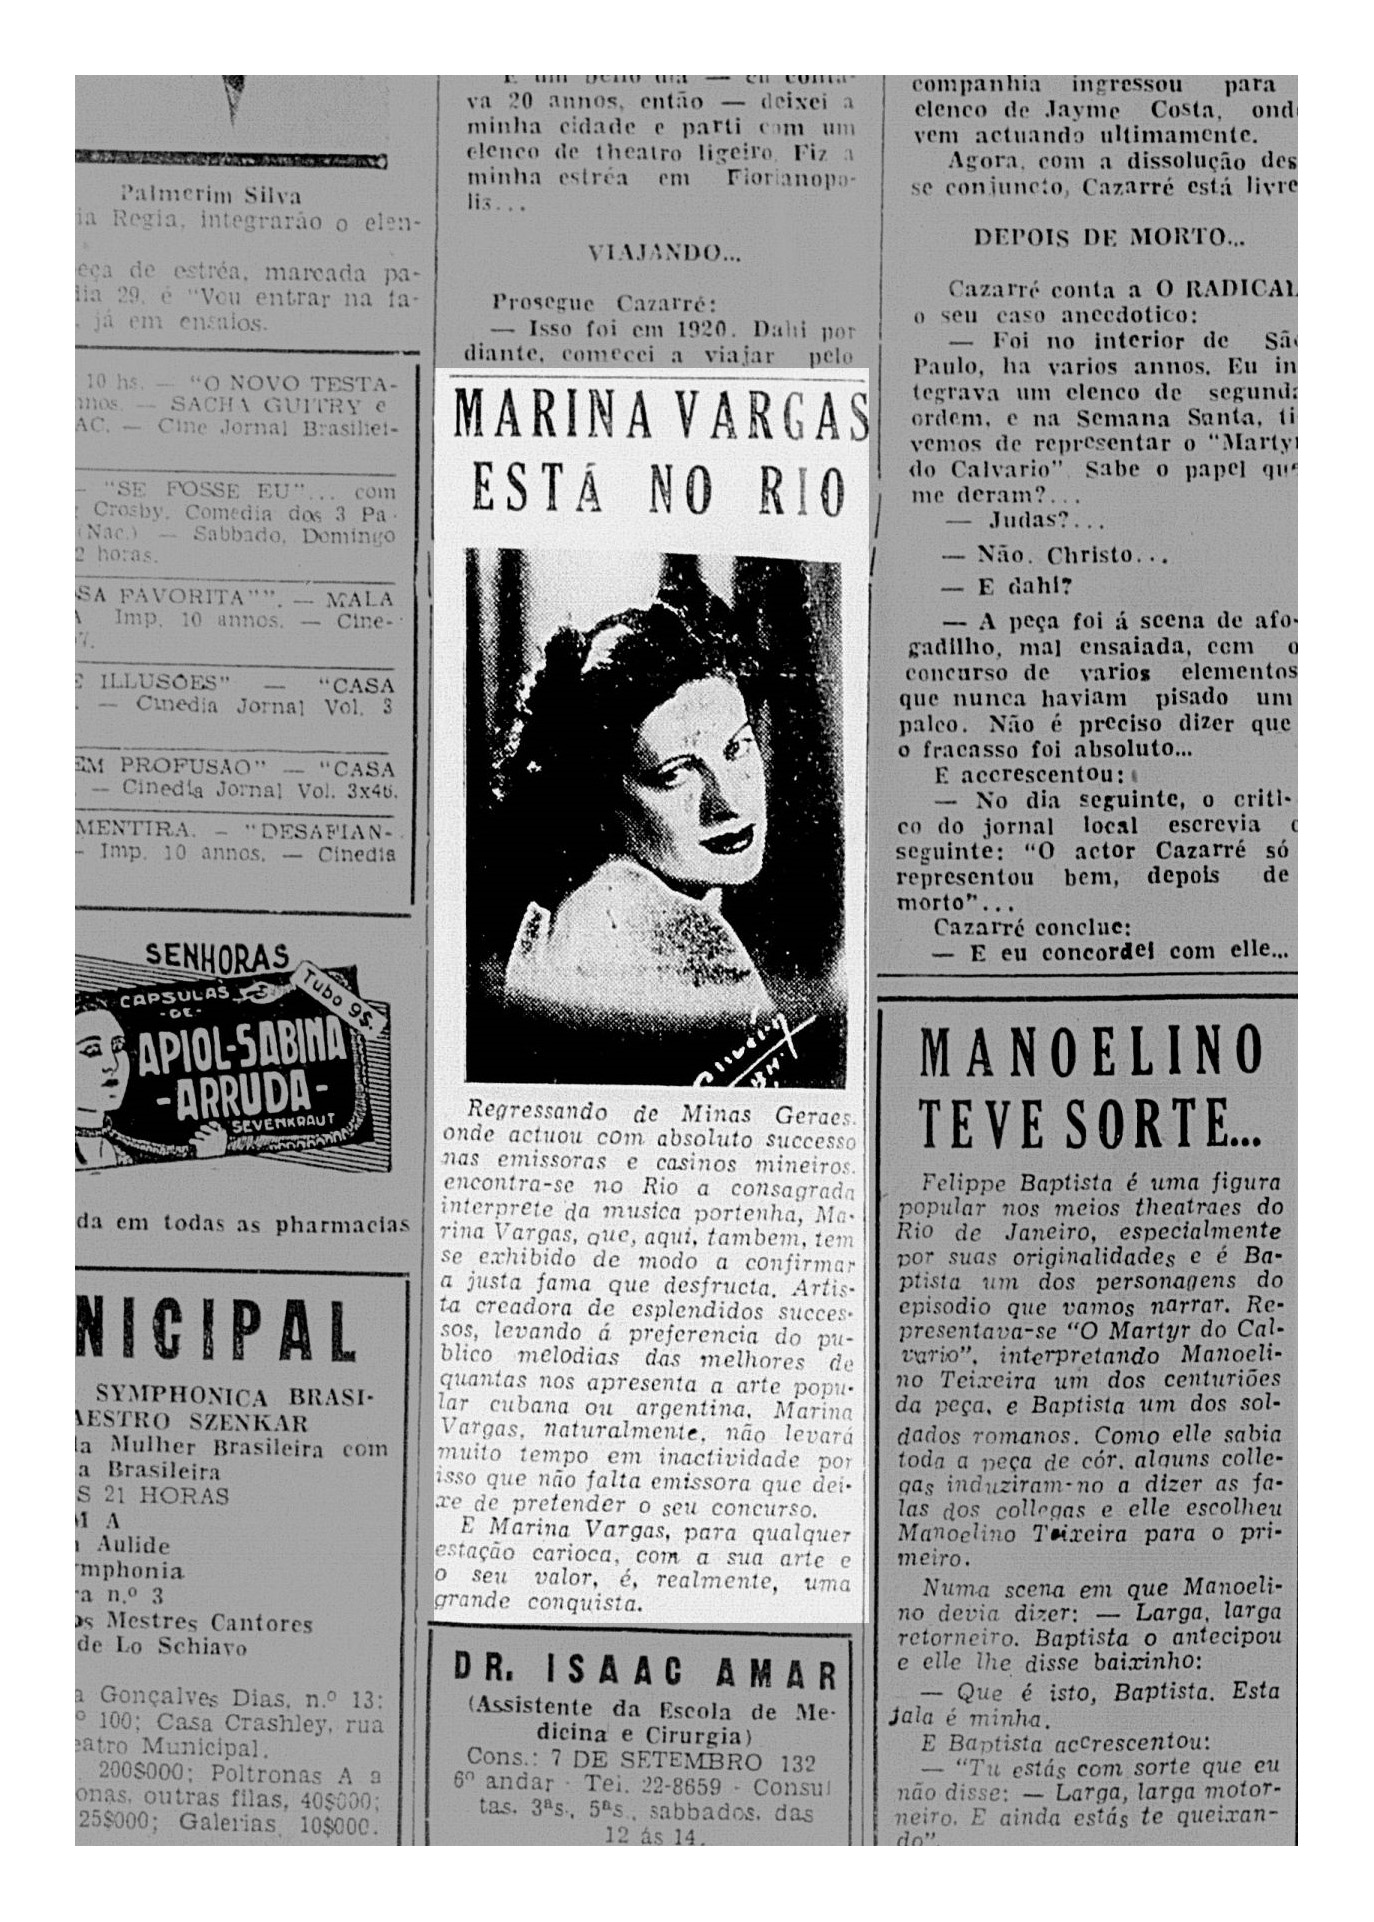 Marina-Vargas-1940-11-24_ORadical_RioDeJaneiro-RJ-2-copy1.jpg